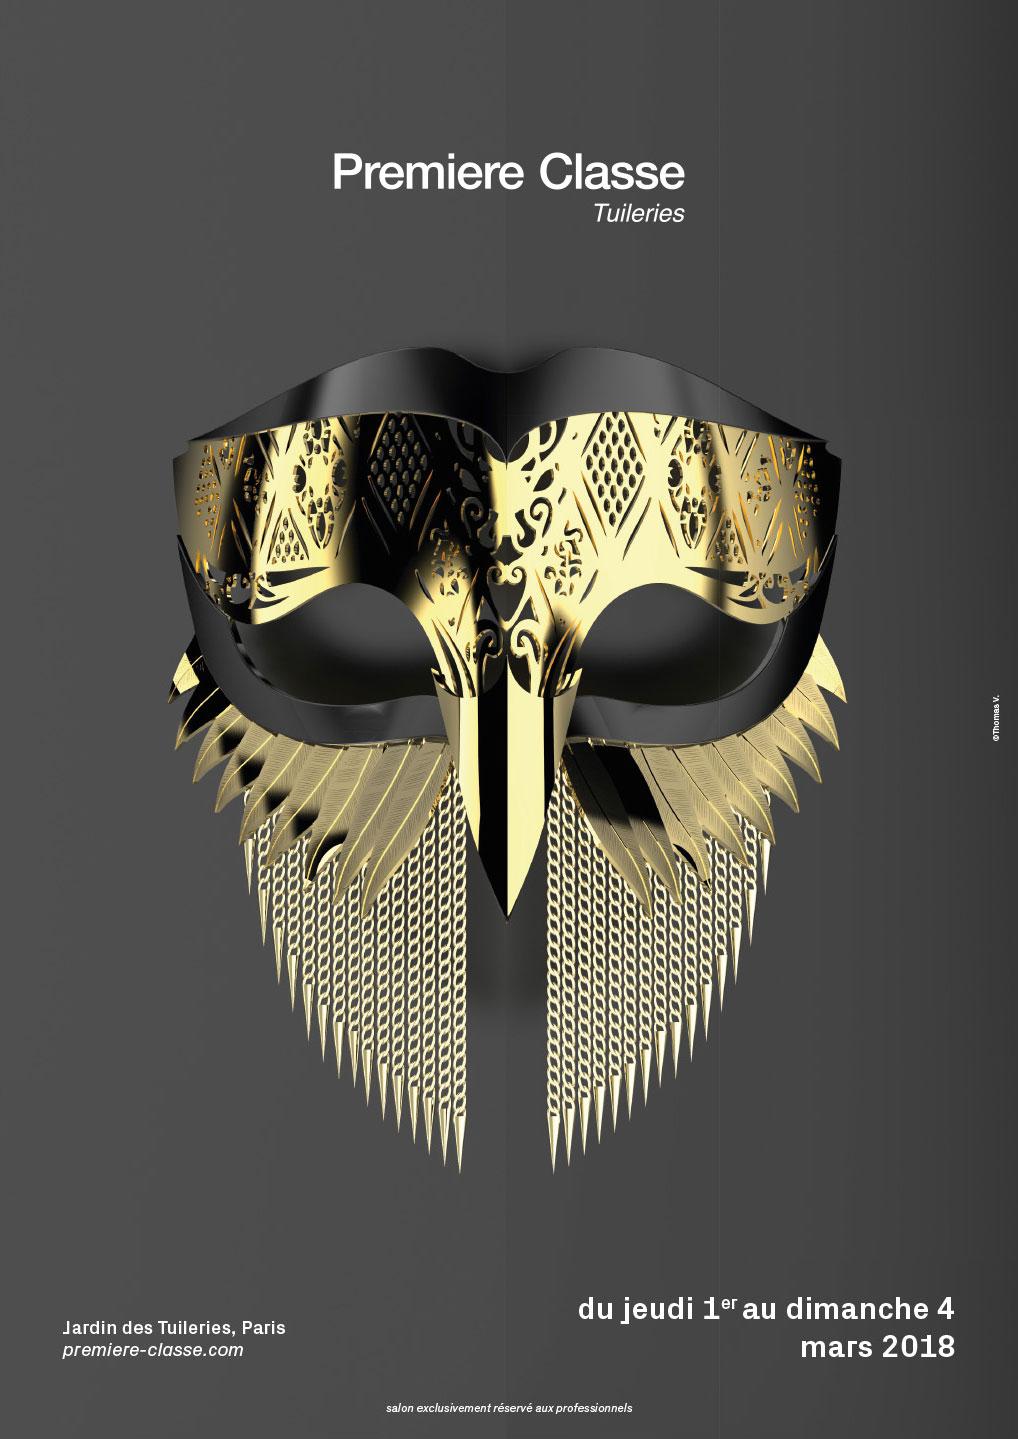 premiere classe masque thomas V